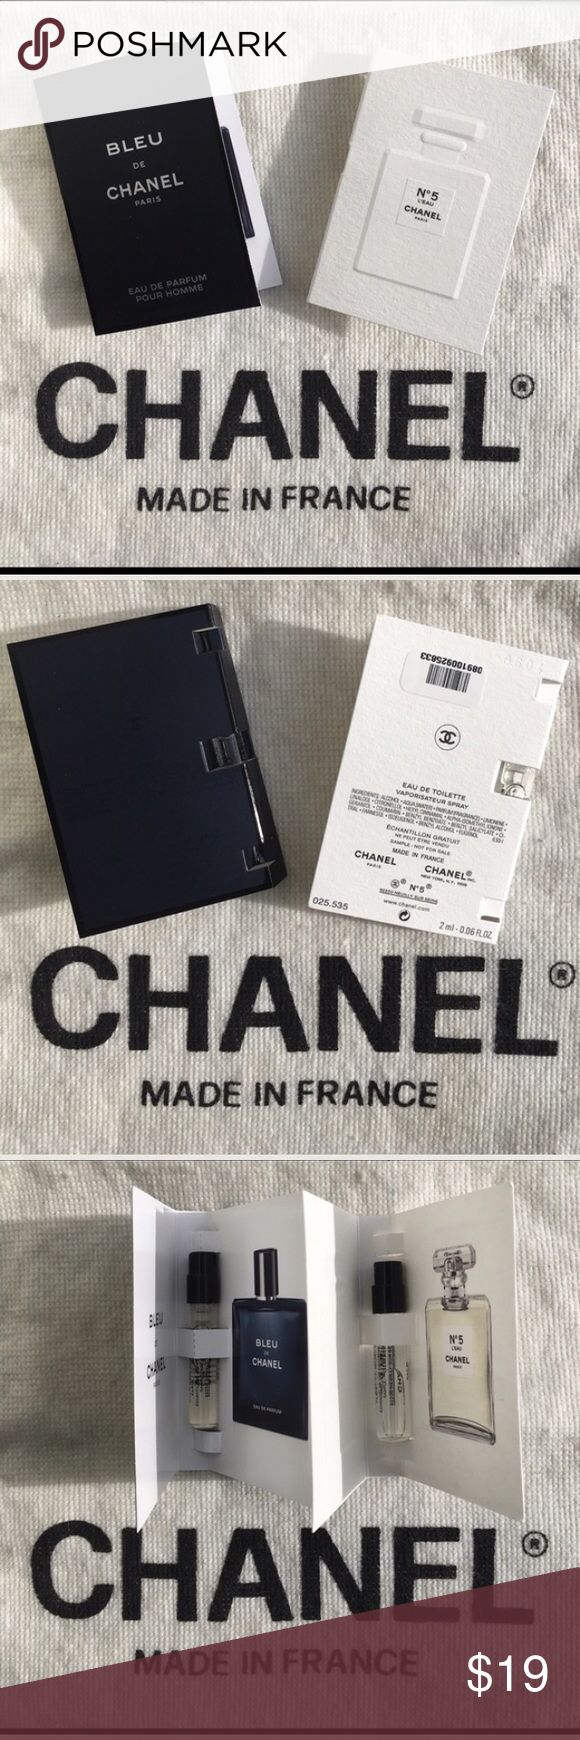 🆕 CHANEL Bleu De CHANEL & N*5 L'EAU CHANEL. 🆕 CHANEL Bleu De CHANEL & N*5 L'EAU CHANEL. Includes Bleu De Chanel Men's Travel & N*5 L'Eau CHANEL Travel His & Hers CHANEL. These are BRAND NEW! UNTOUCHED! Sephora Makeup